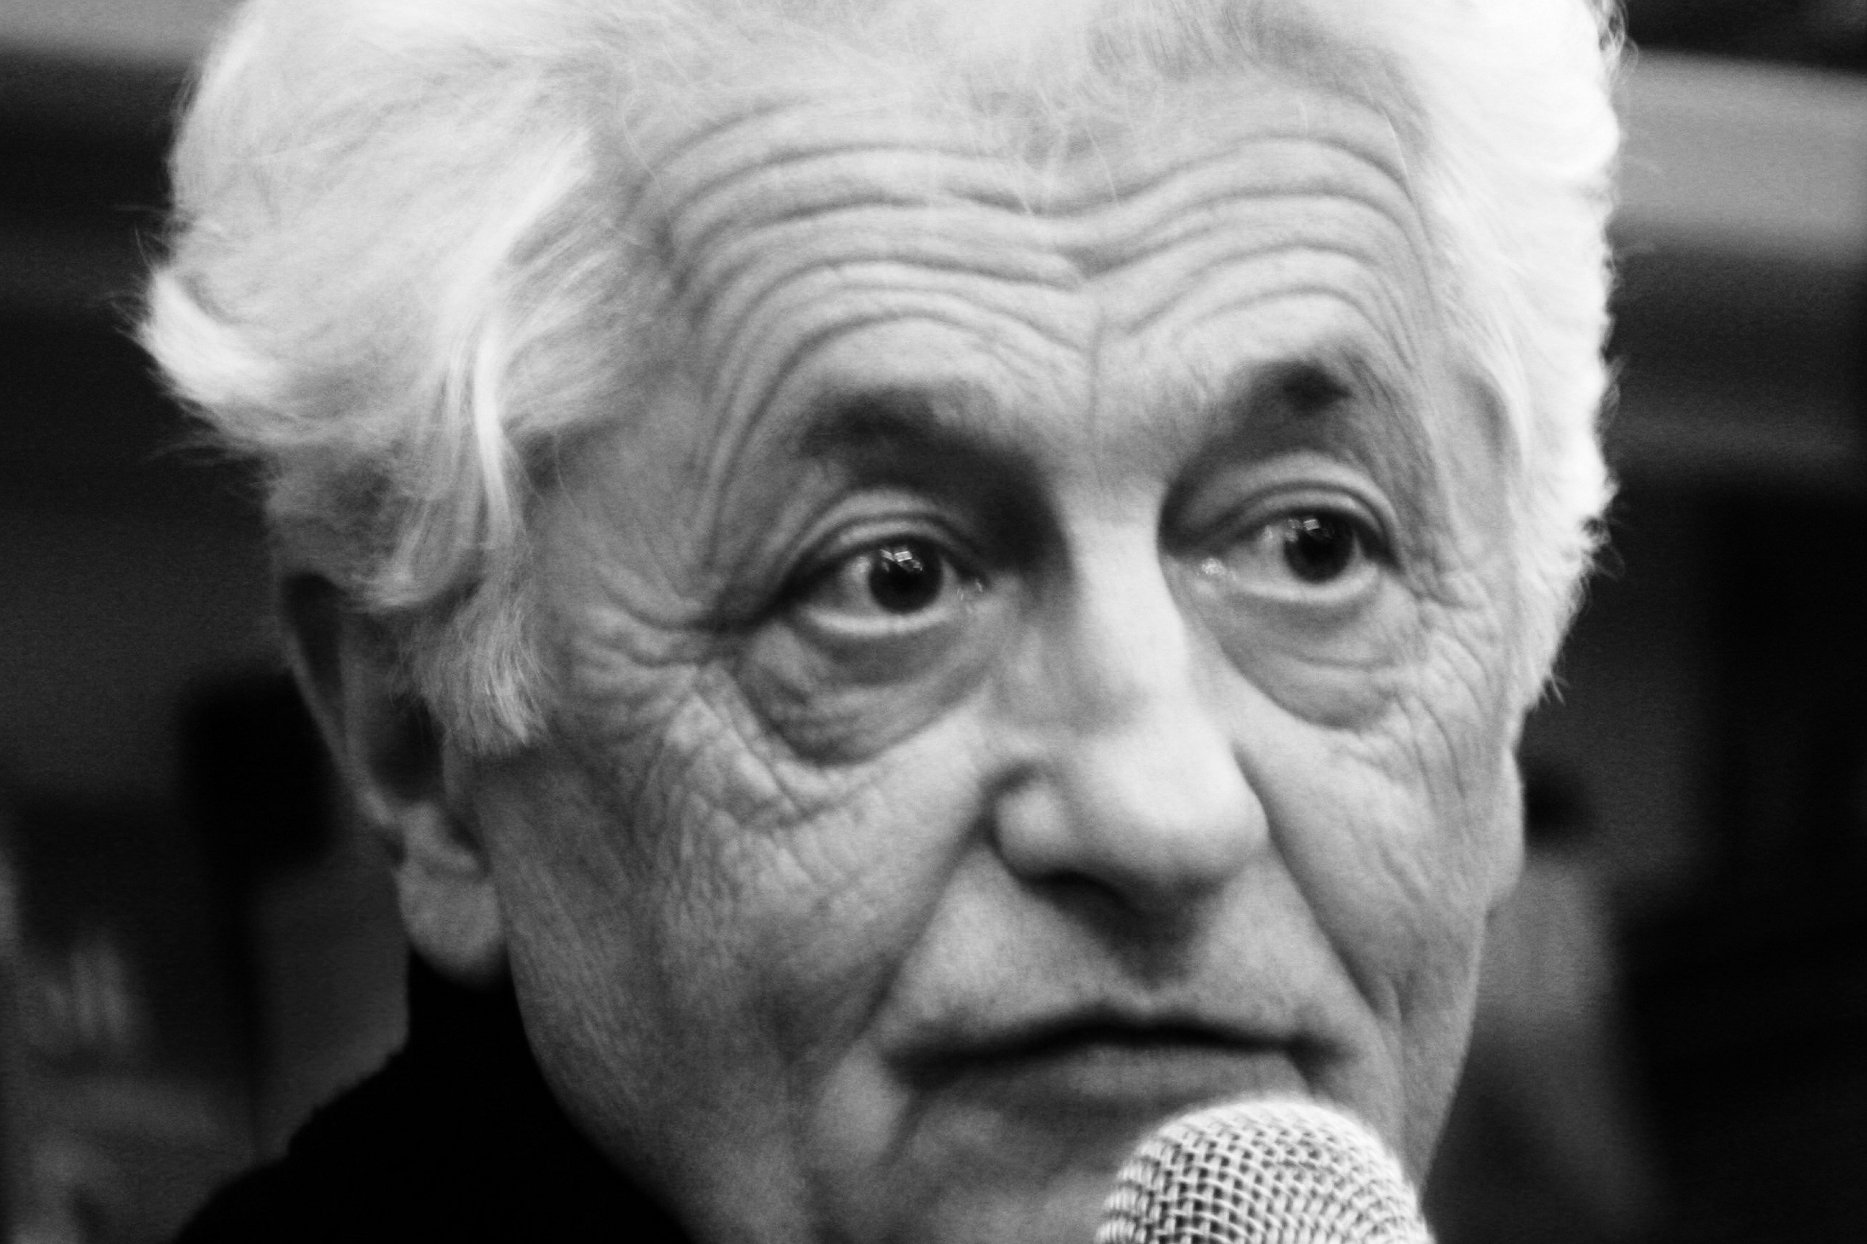 Portrait of Macchiavelli in 2008